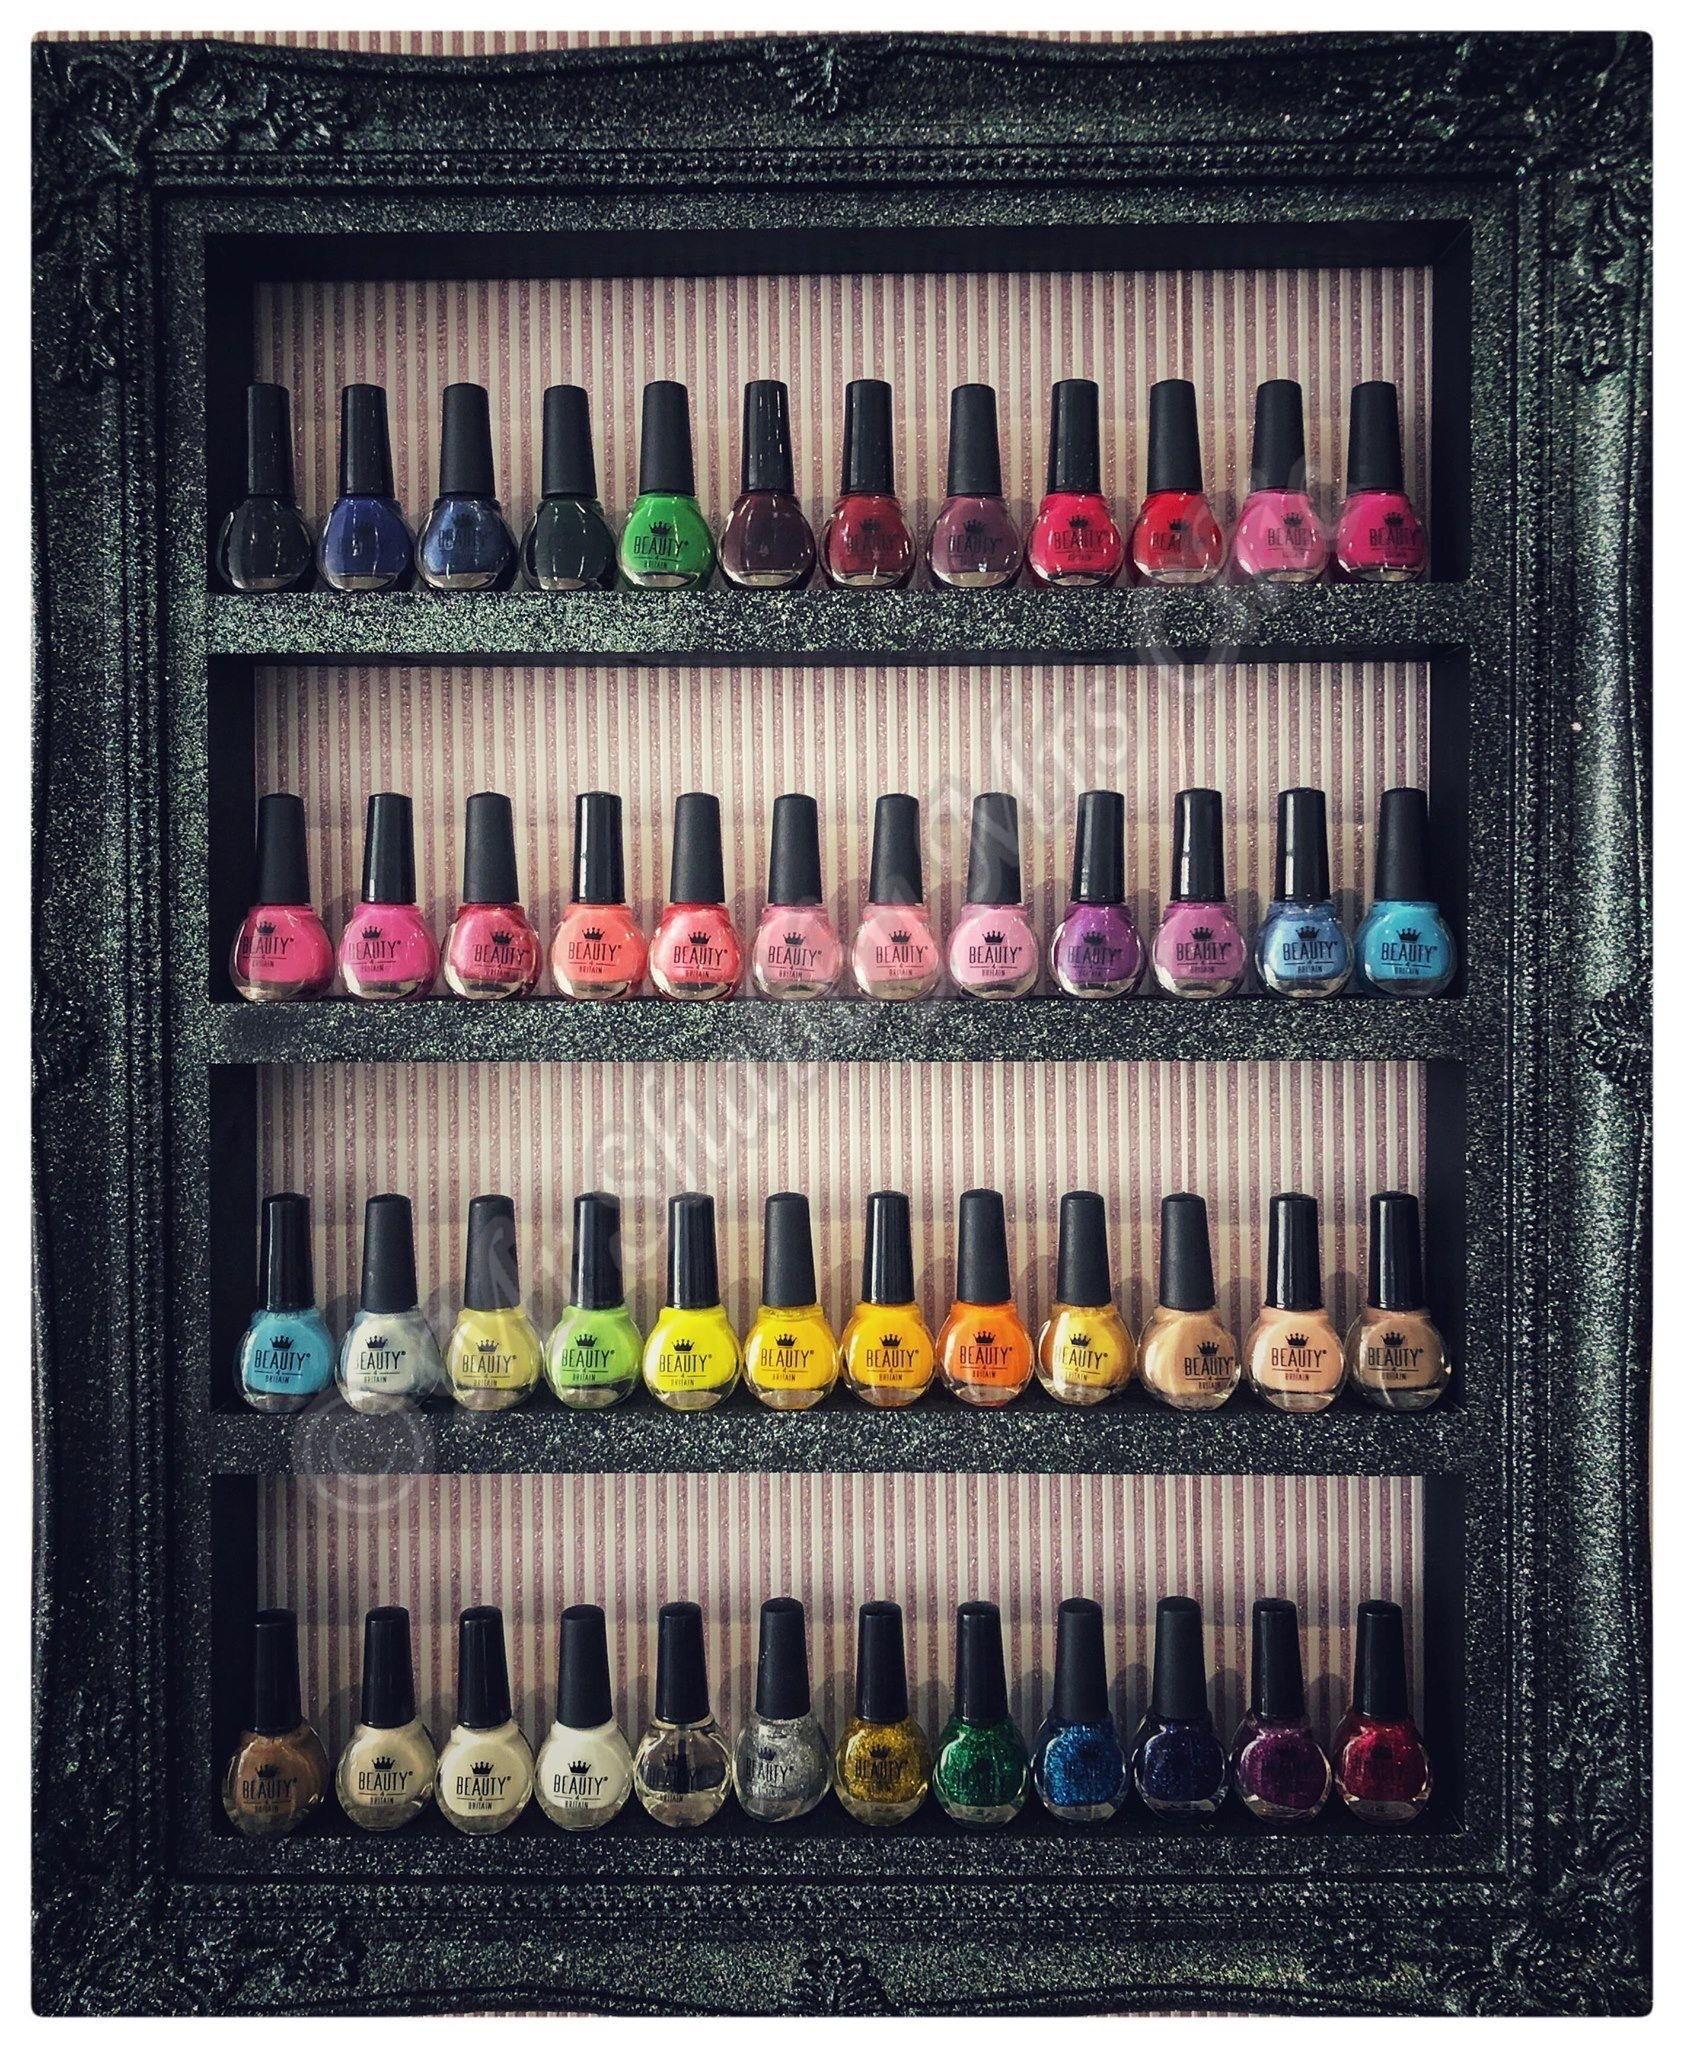 #fashion #stunningdresses #beautyblog #nailblogger #salon #salondecor